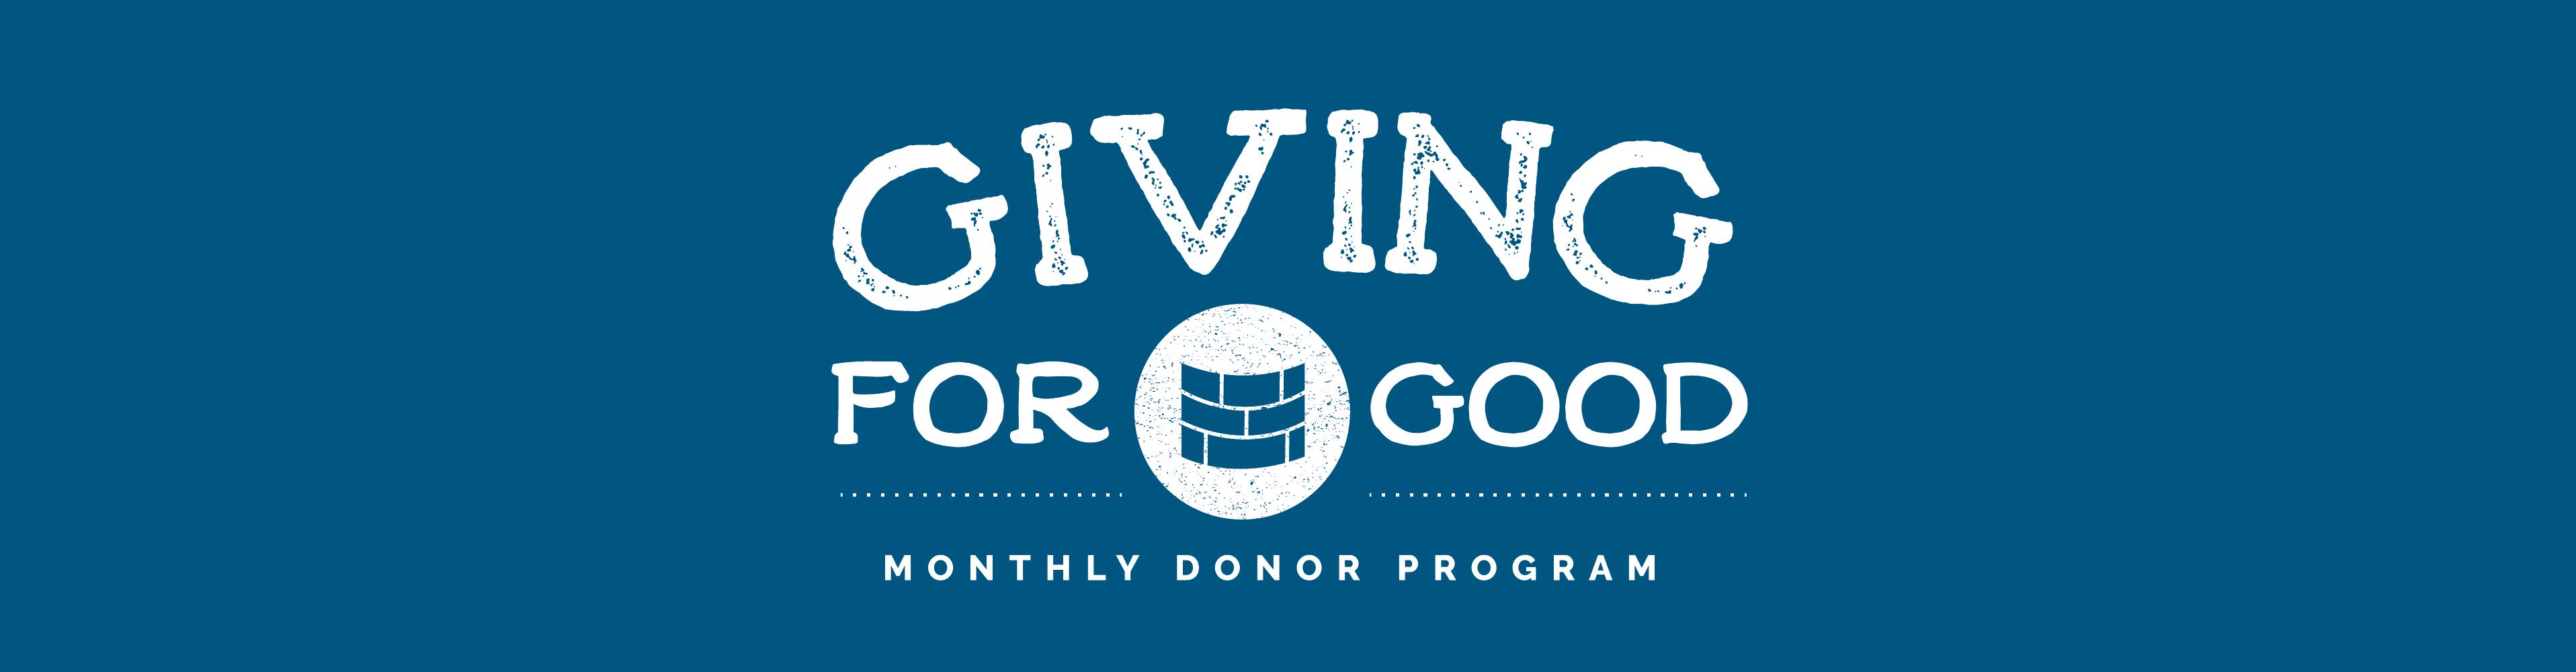 Giving for good header